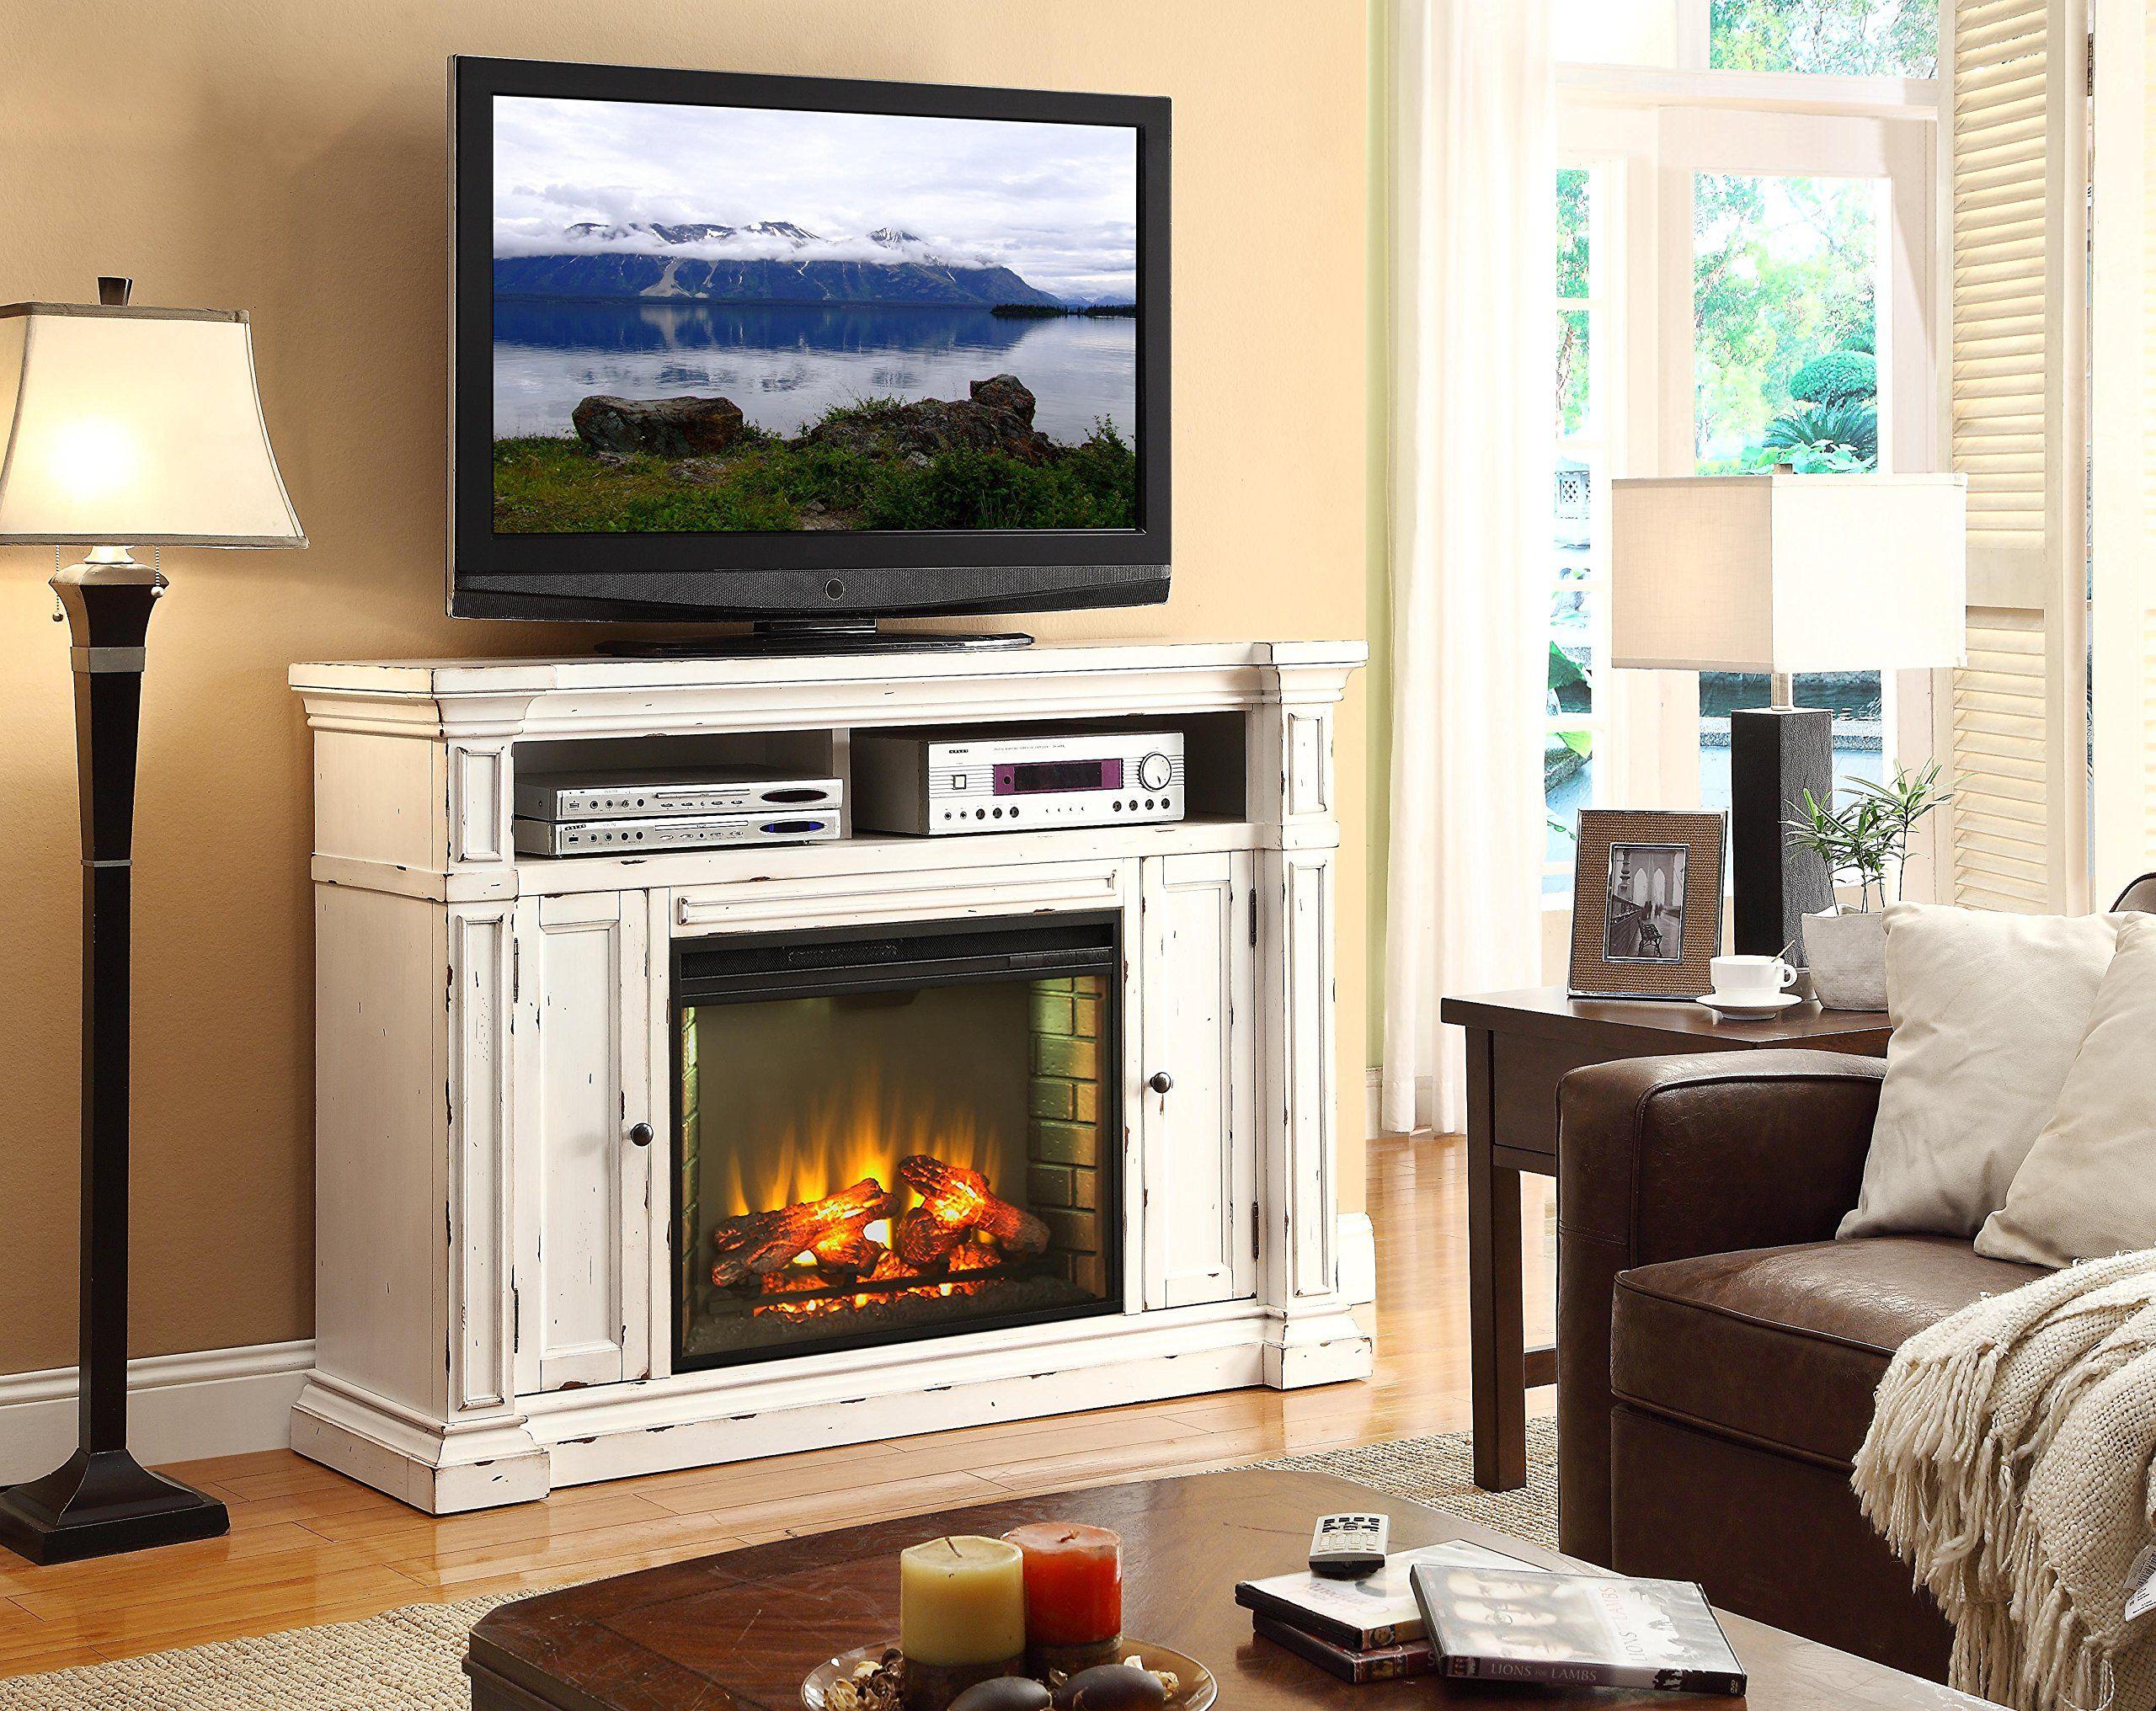 "legends furniture new castle znca-1900 58"" fireplace media center"